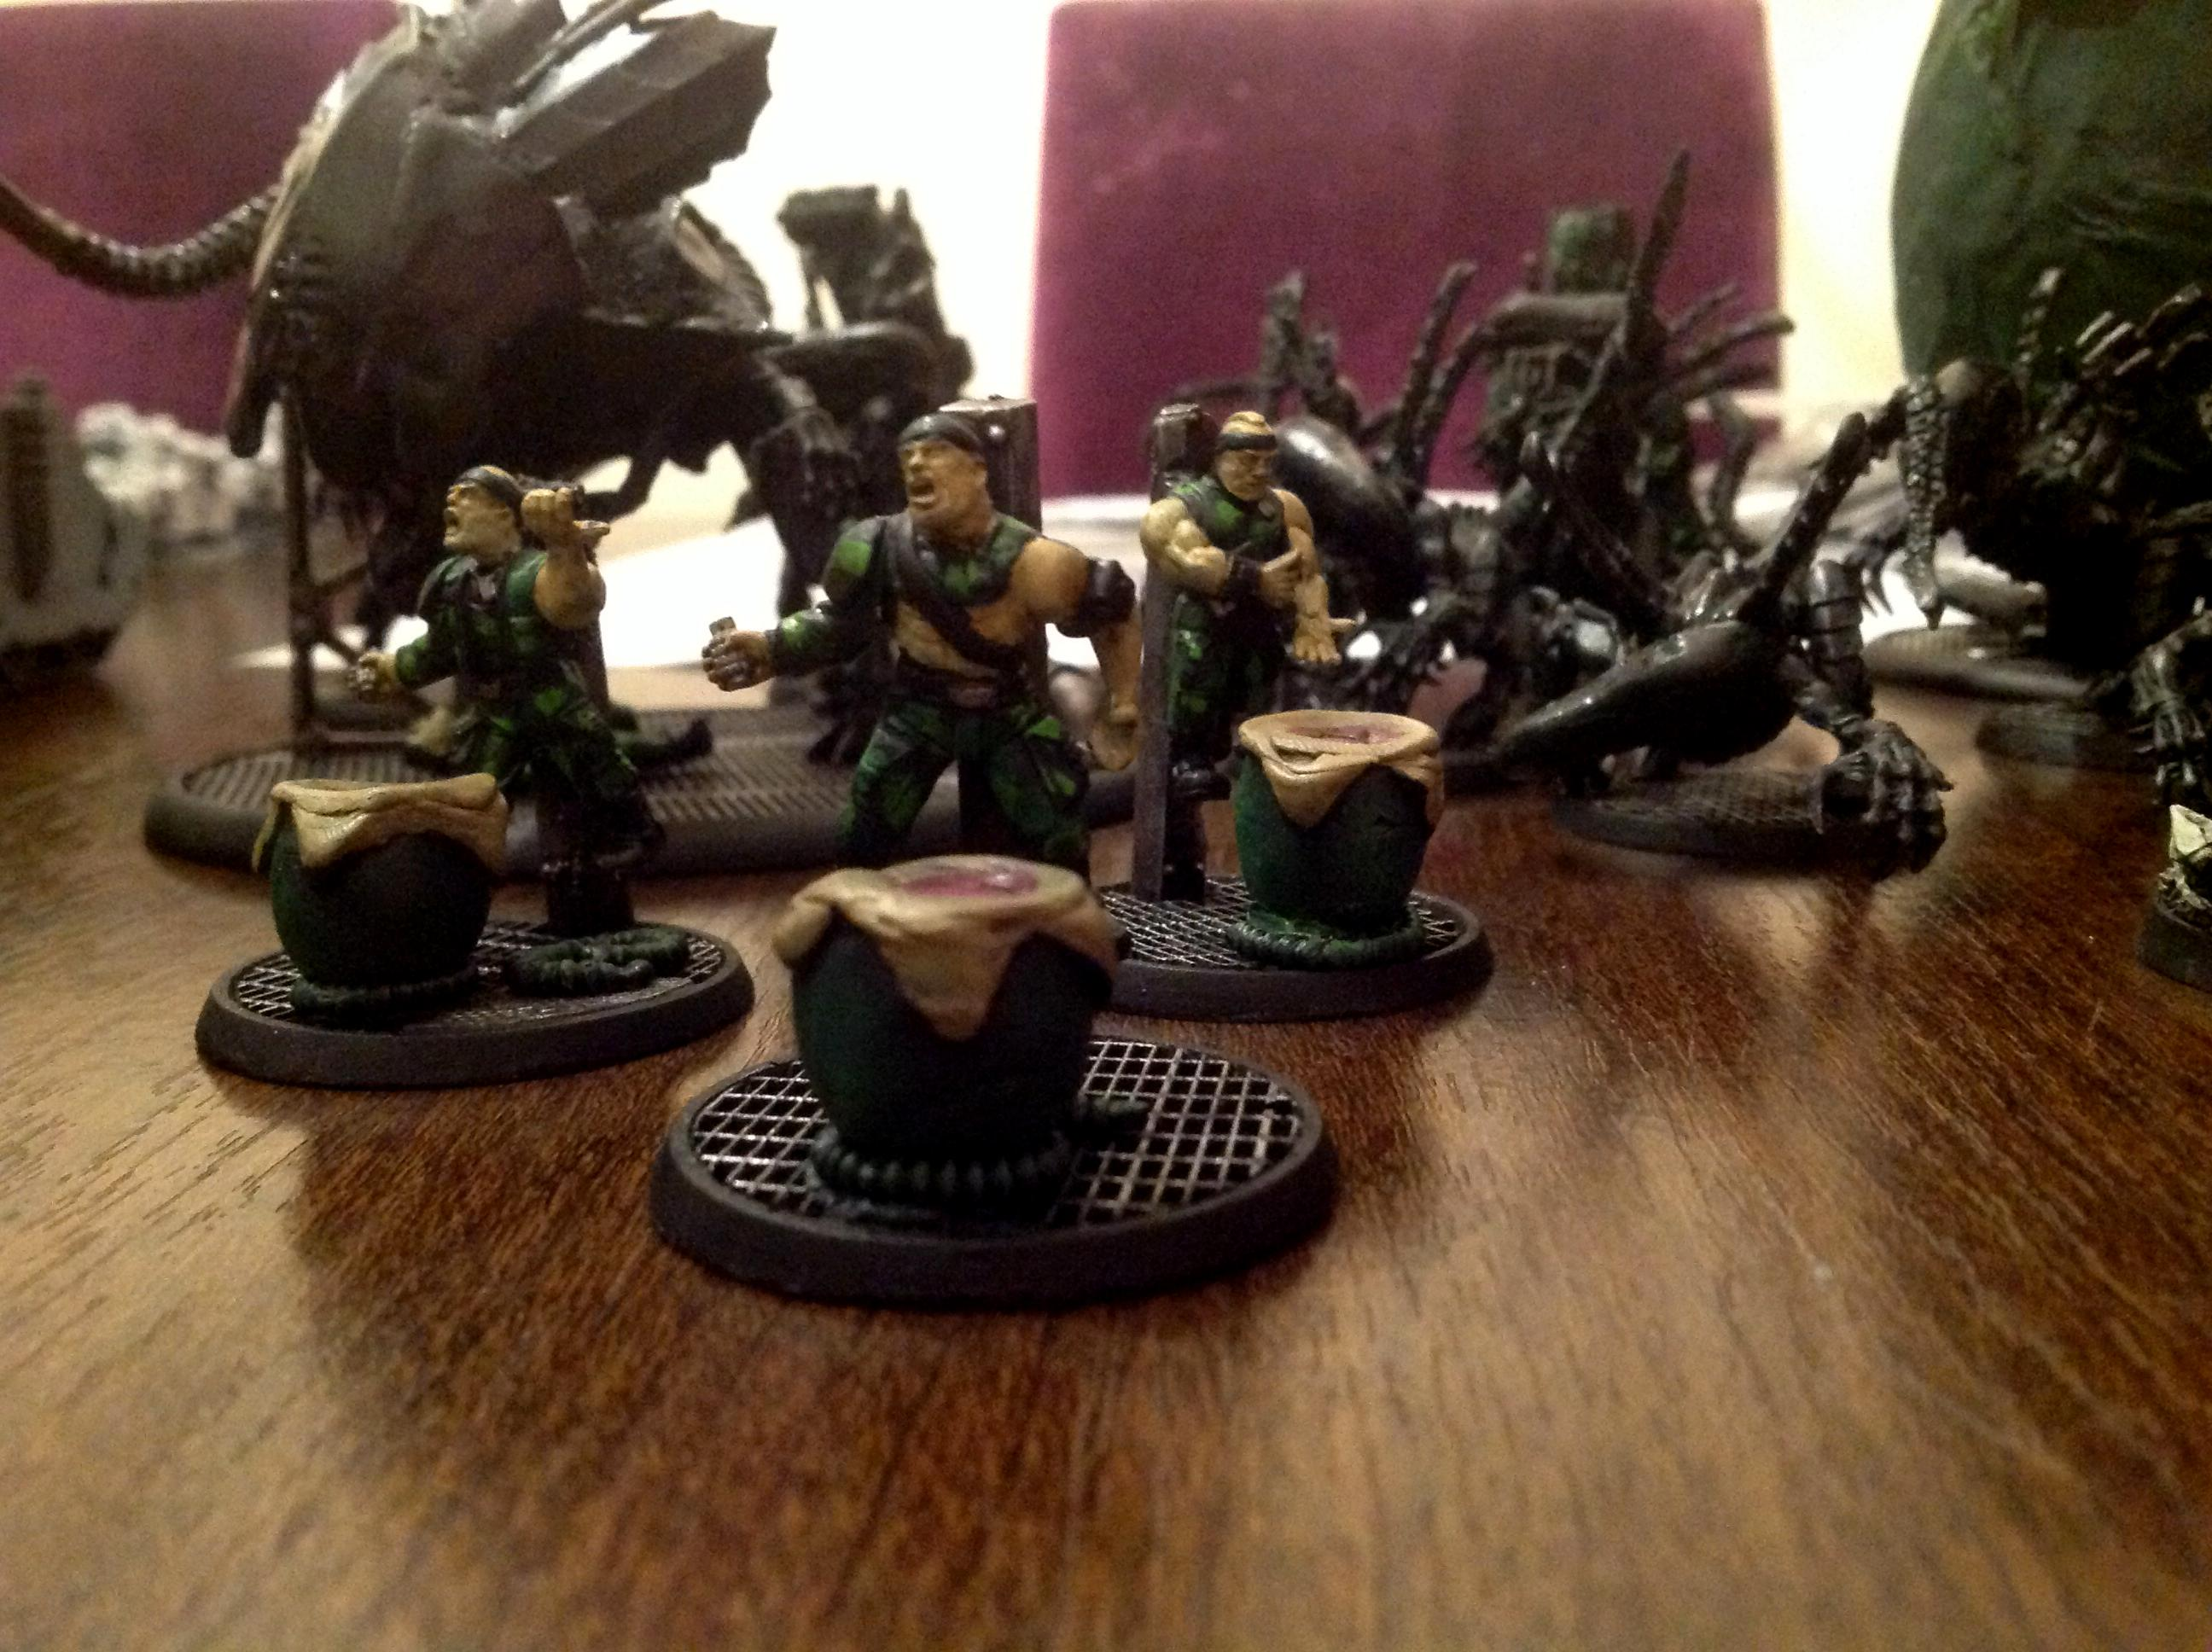 Alien, Aliens, Deathleaper, Doom Of Malantai, Genestealer, Hive Fleet, Mycetic Spore, Spore, Spore Mine Clusters, Swarmlord, Tyranids, Warhammer 40,000, Warriors, Ymgarl Genestealers